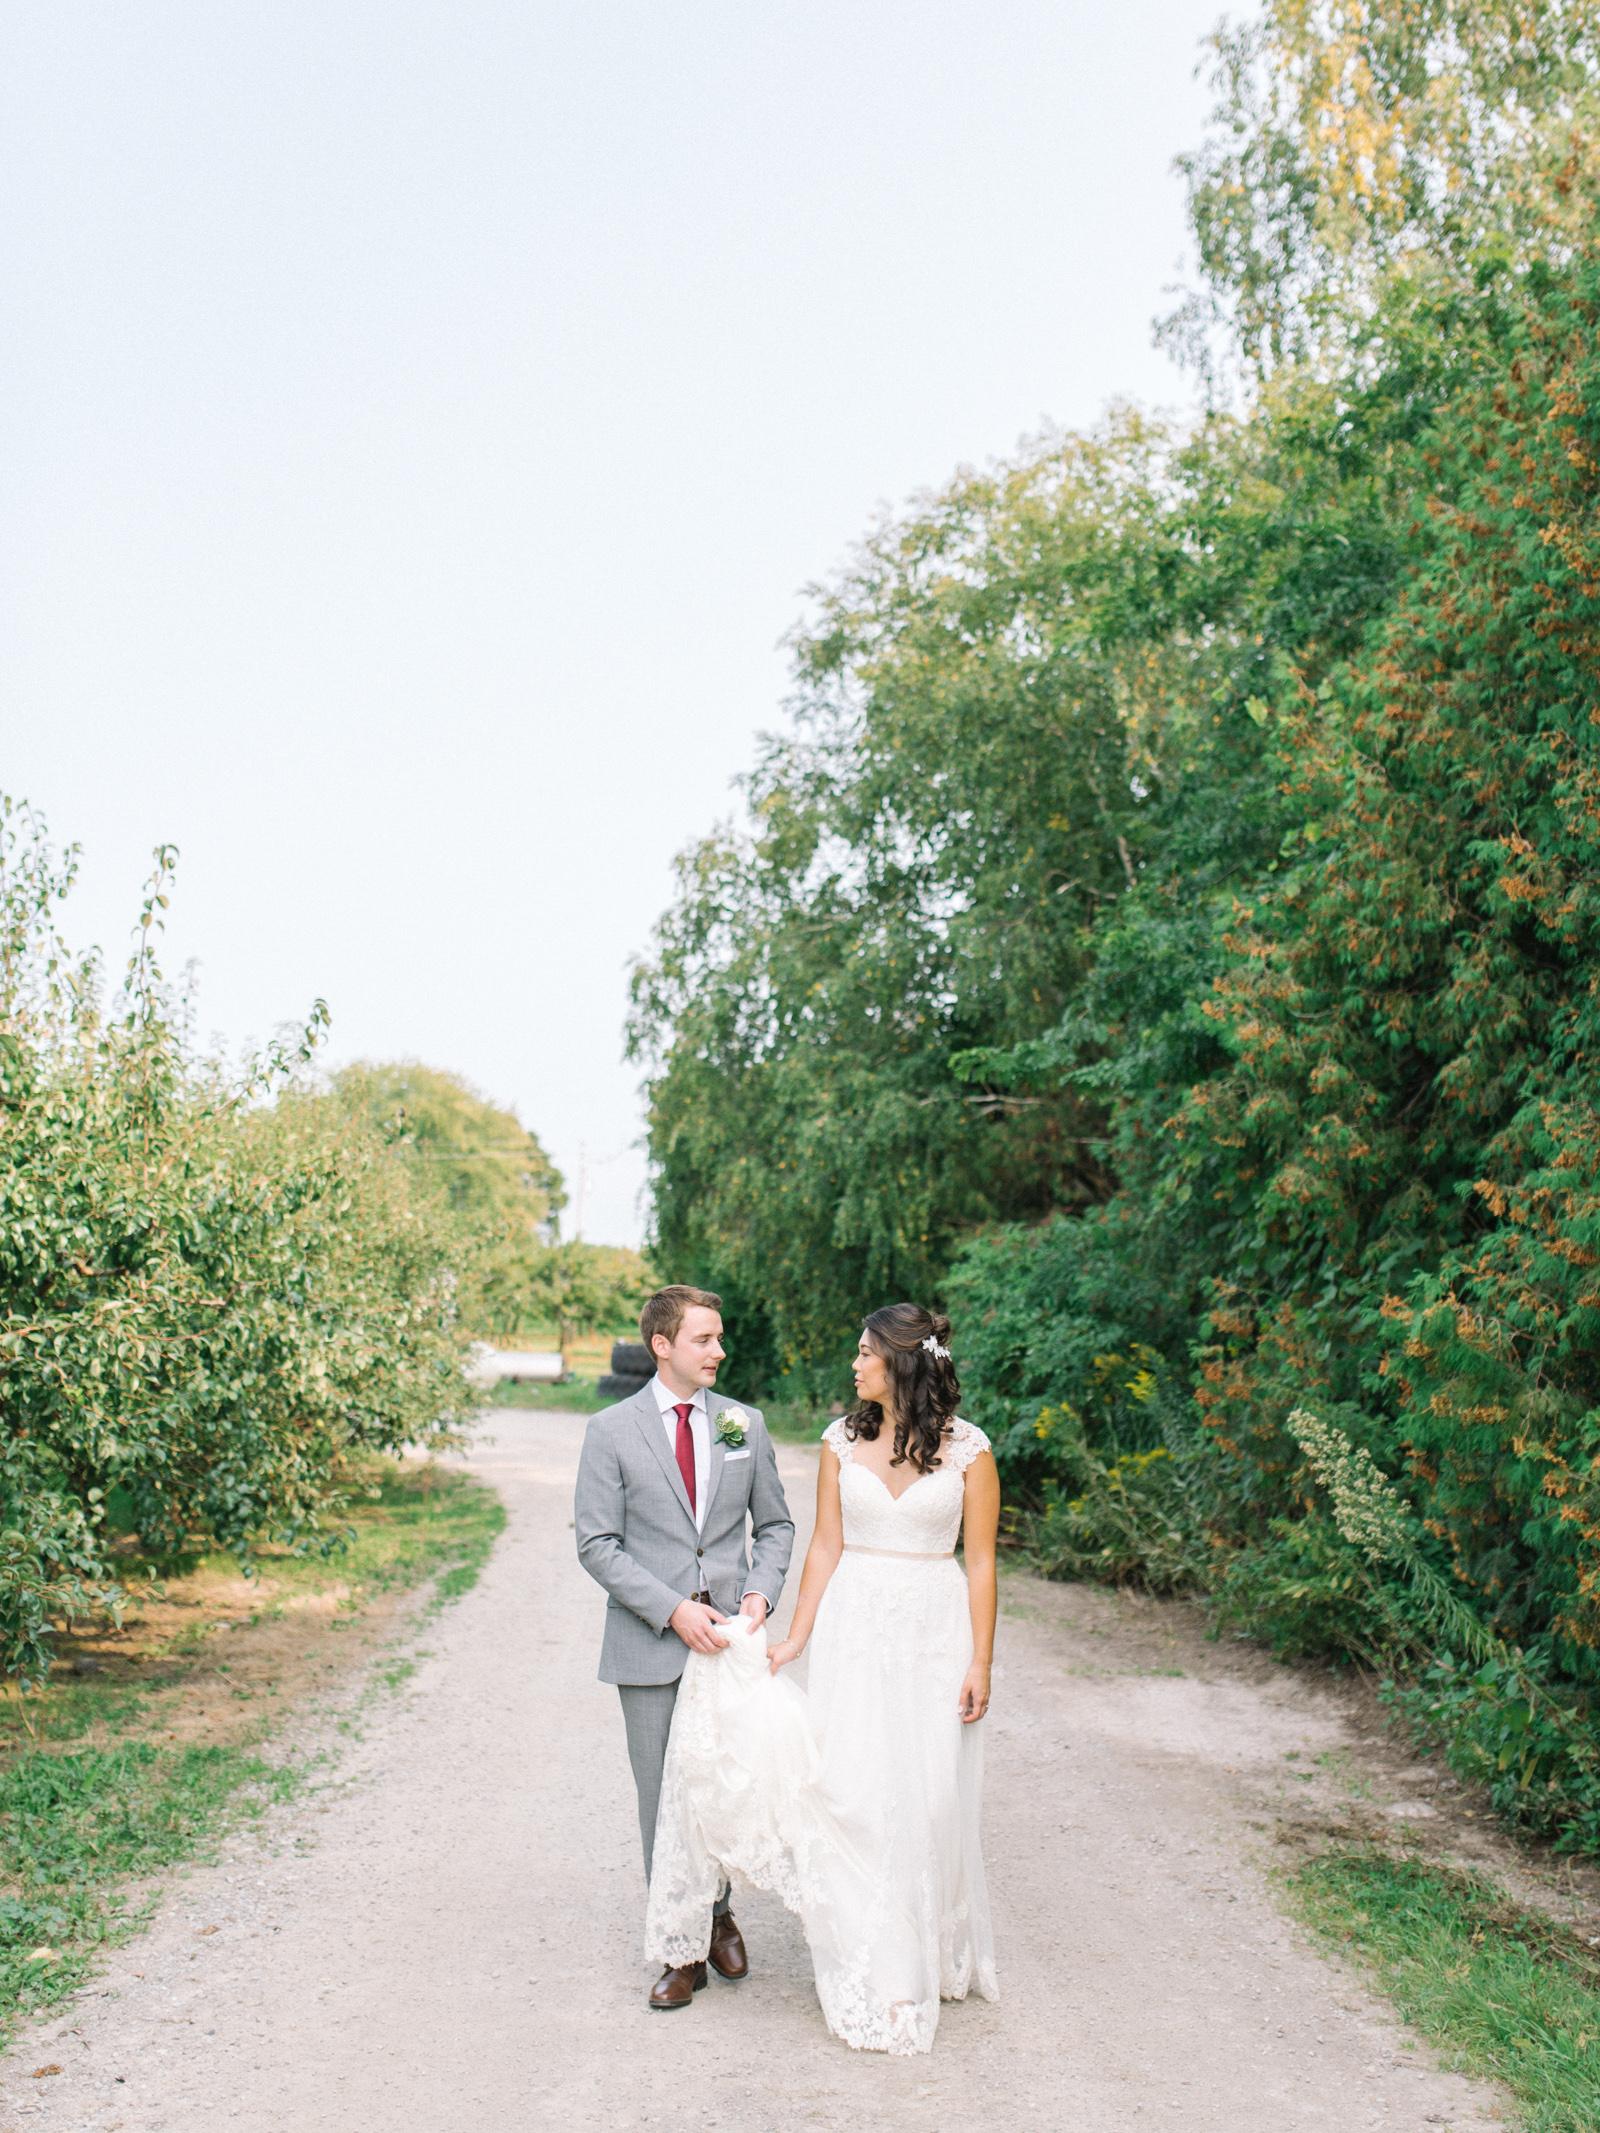 Honsberger Estate Wedding   Hamilton & Destination Wedding PhotographerHonsberger Estate Wedding   Hamilton & Destination Wedding Photographer